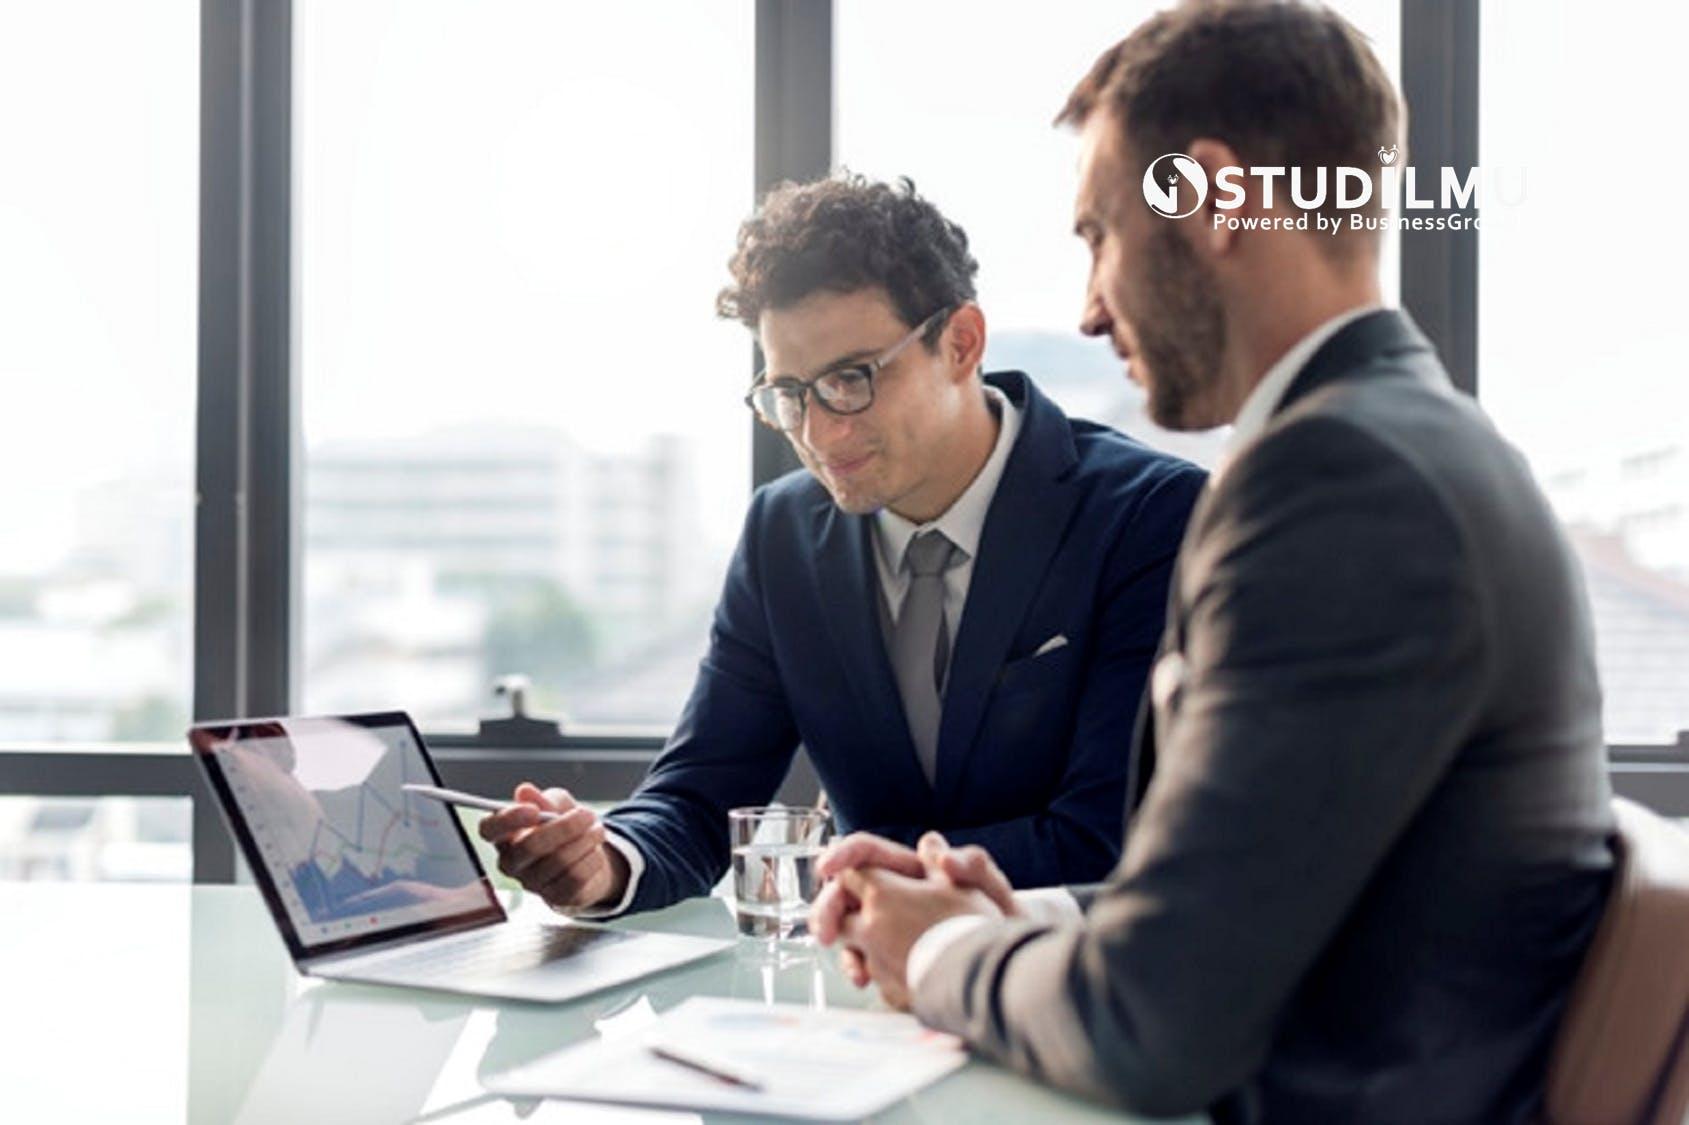 STUDILMU Career Advice -  7 Tanda Kita Terlalu Sibuk Kerja